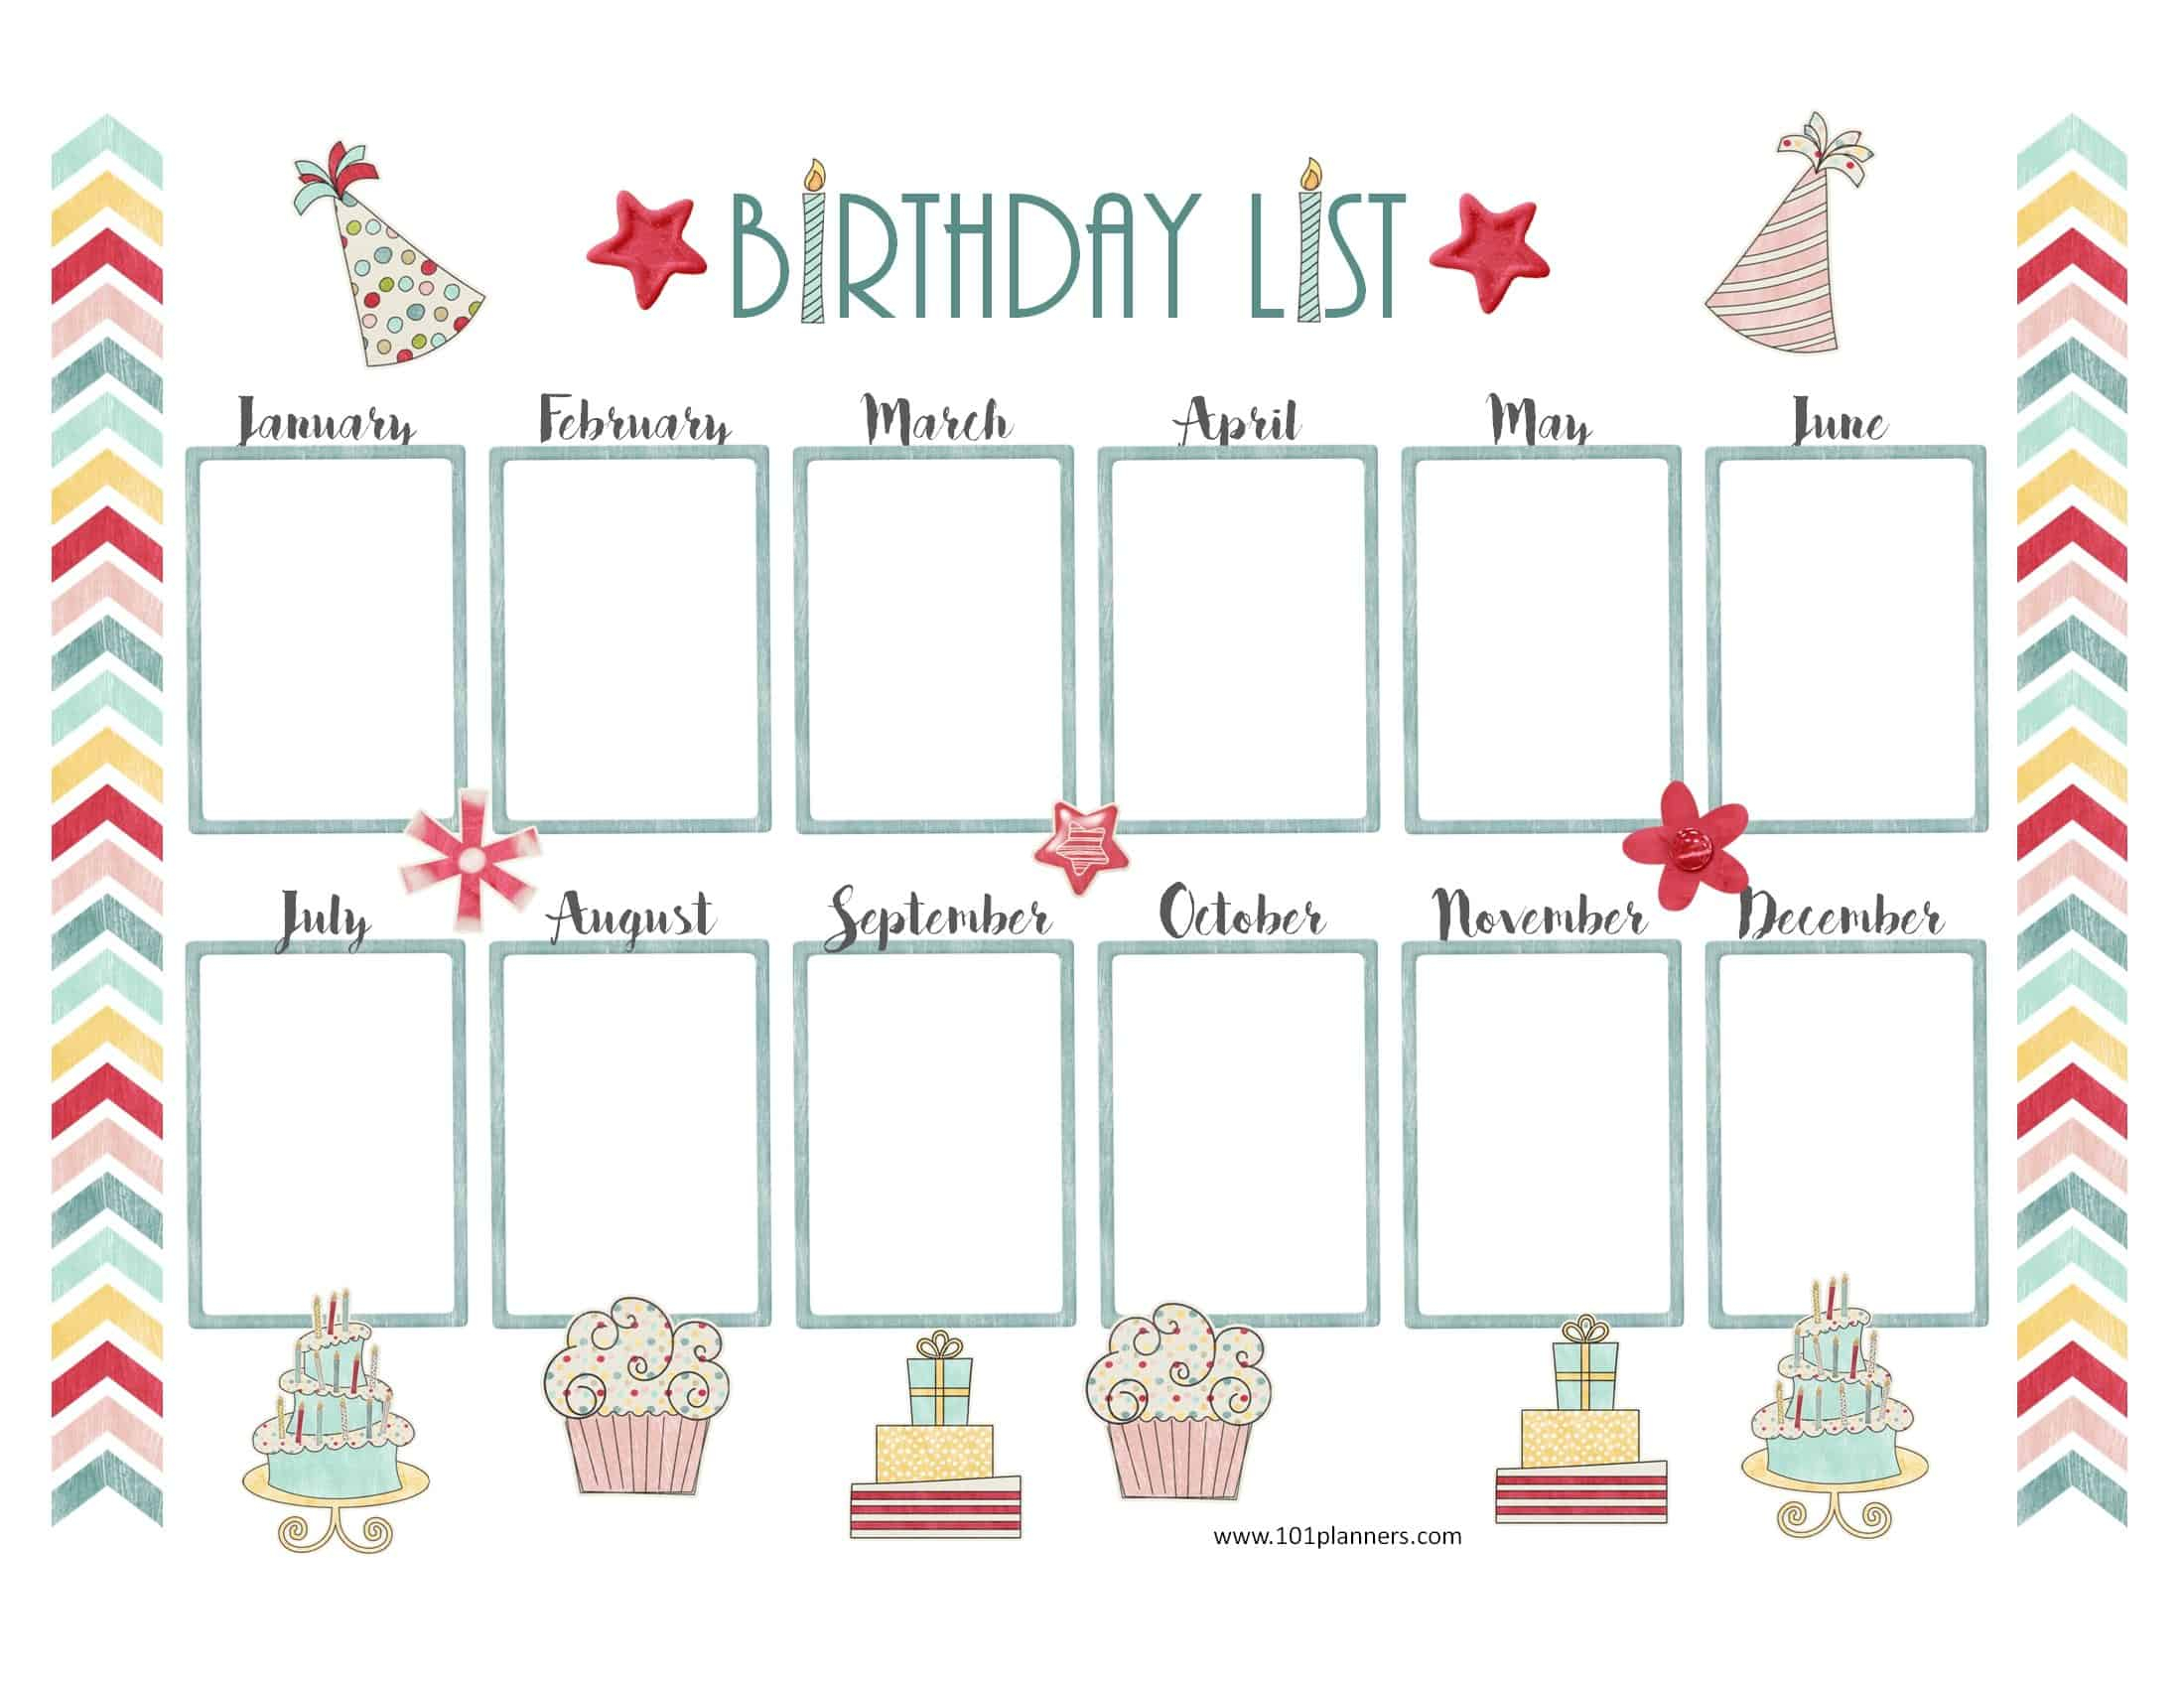 22. 4 Birthday Charts Freeology, Editable Birthday Chart Printable - Free Printable Birthday Graph